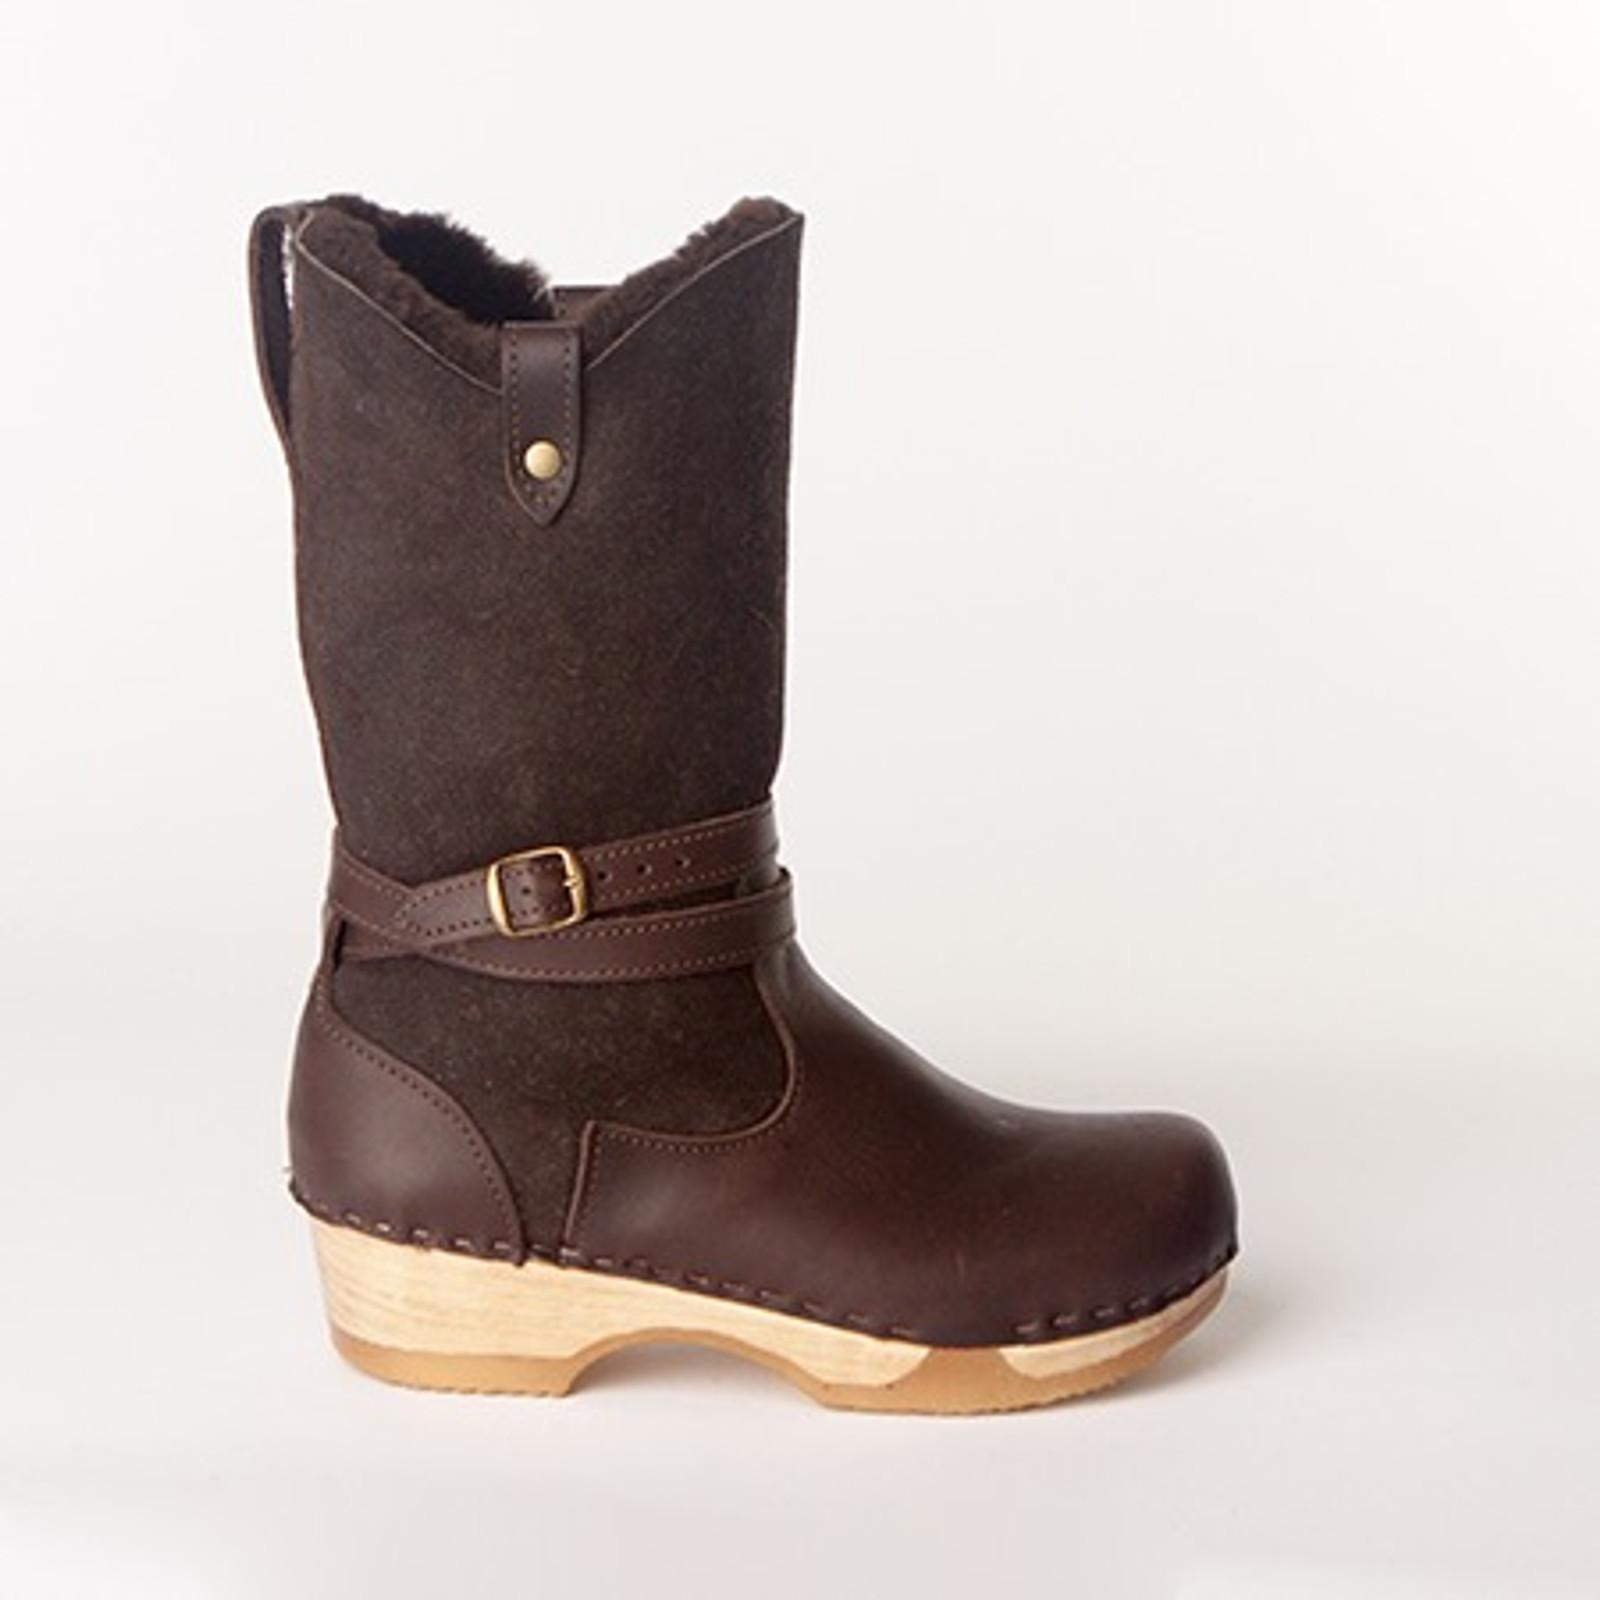 "Lisa - 11"" Shearling Boots - Bendable Low Heel"